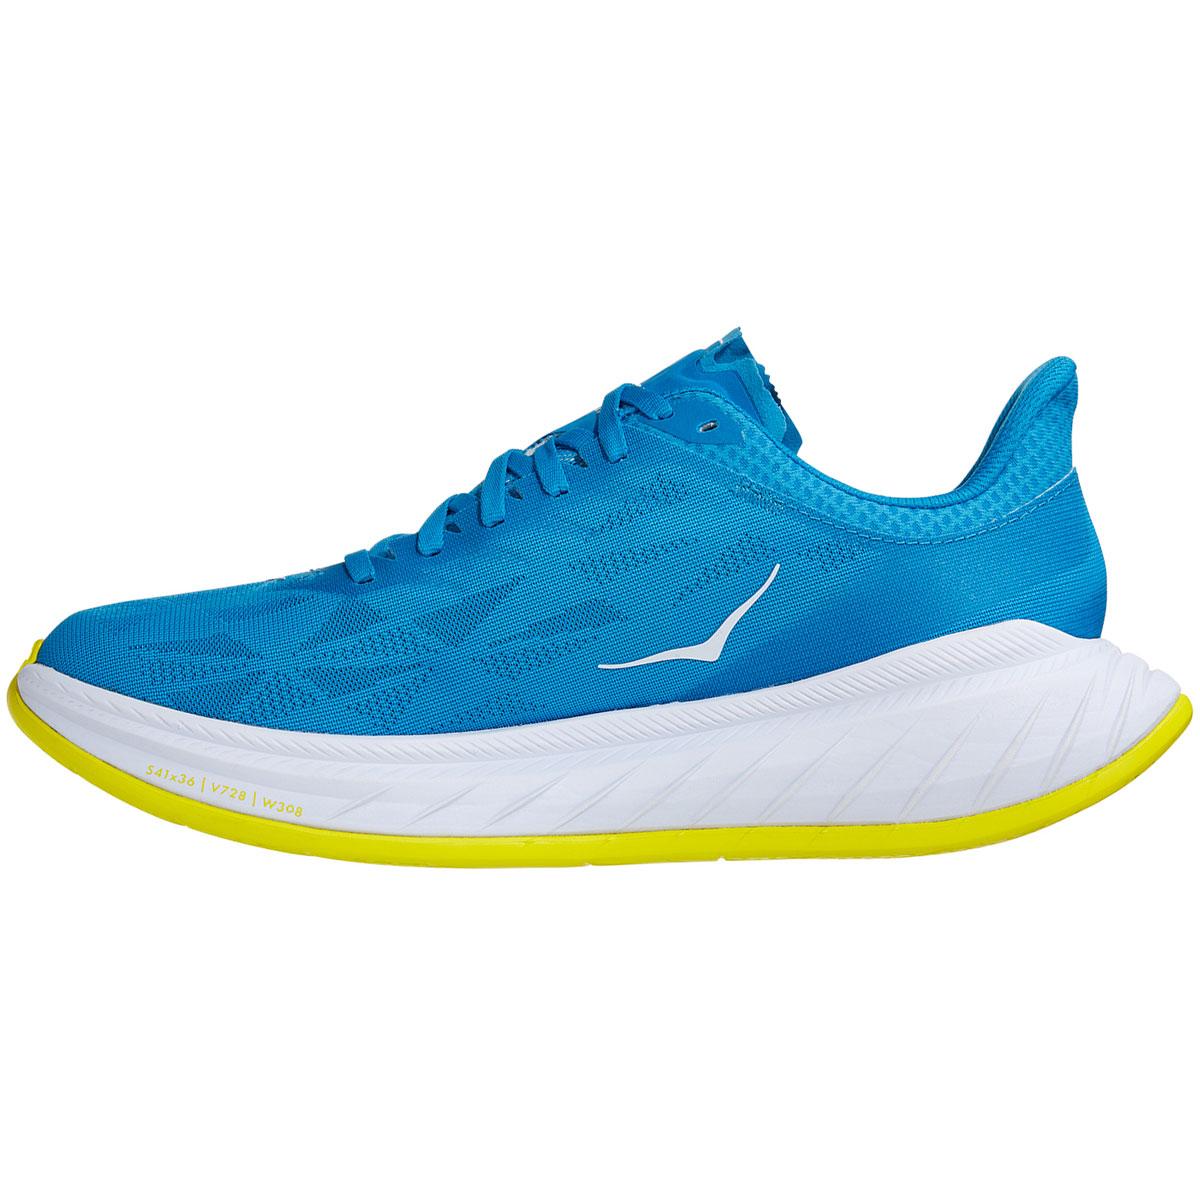 Men's Hoka One One Carbon X 2 Running Shoe - Color: Diva Blue/Citron - Size: 7 - Width: Regular, Diva Blue/Citron, large, image 2